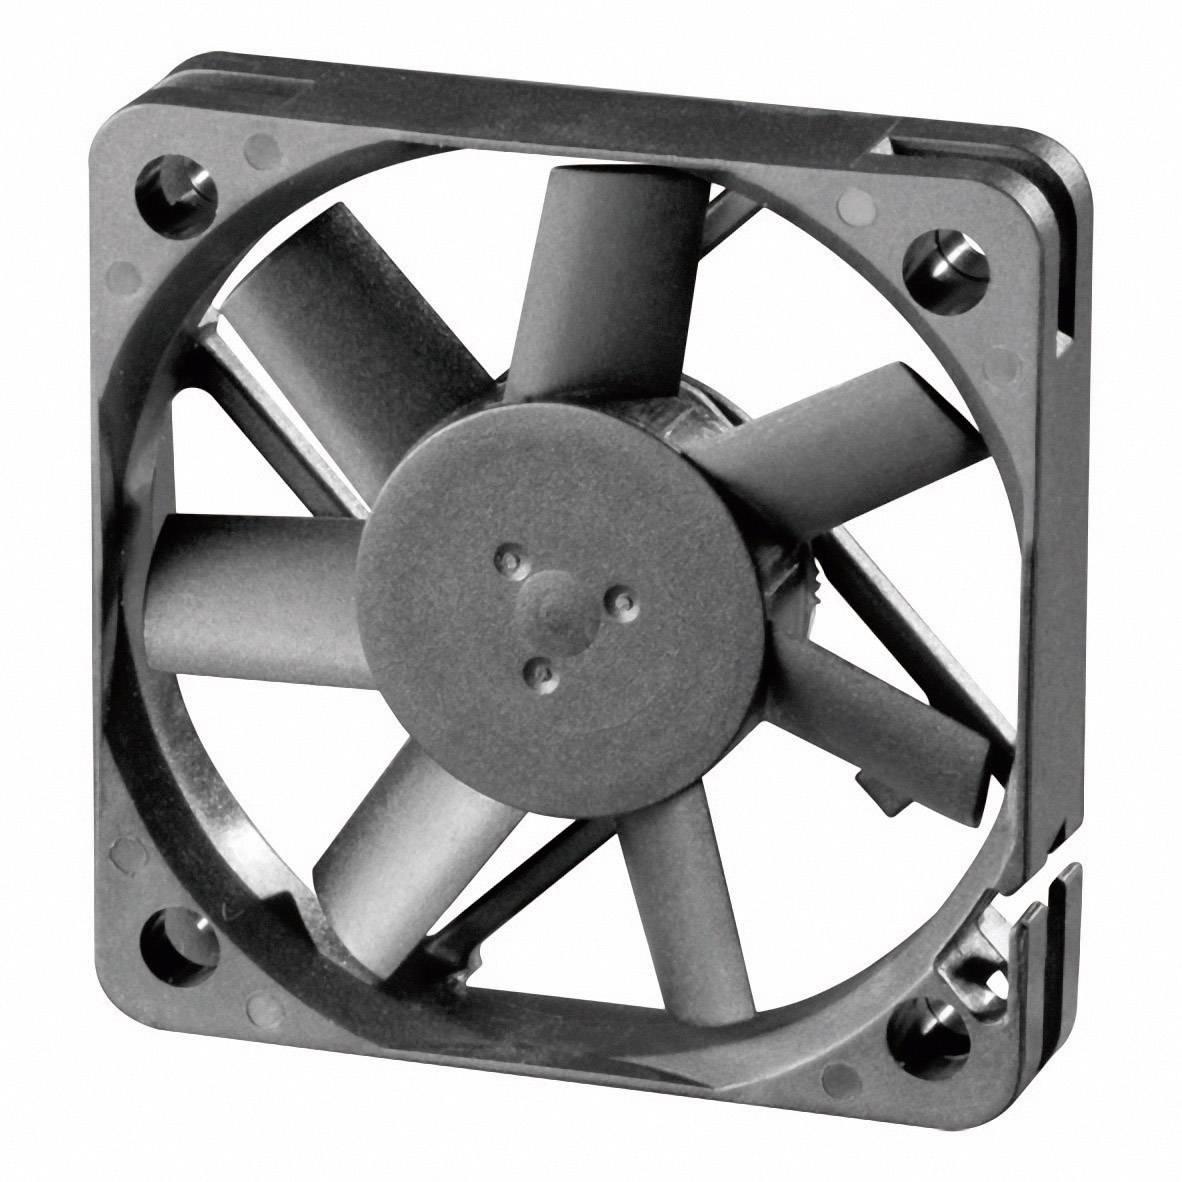 Axiálny ventilátor Sunon EB50101S2-0000-999 EB50101S2-0000-999, 12 V/DC, 26 dB, (d x š x v) 50 x 50 x 10 mm